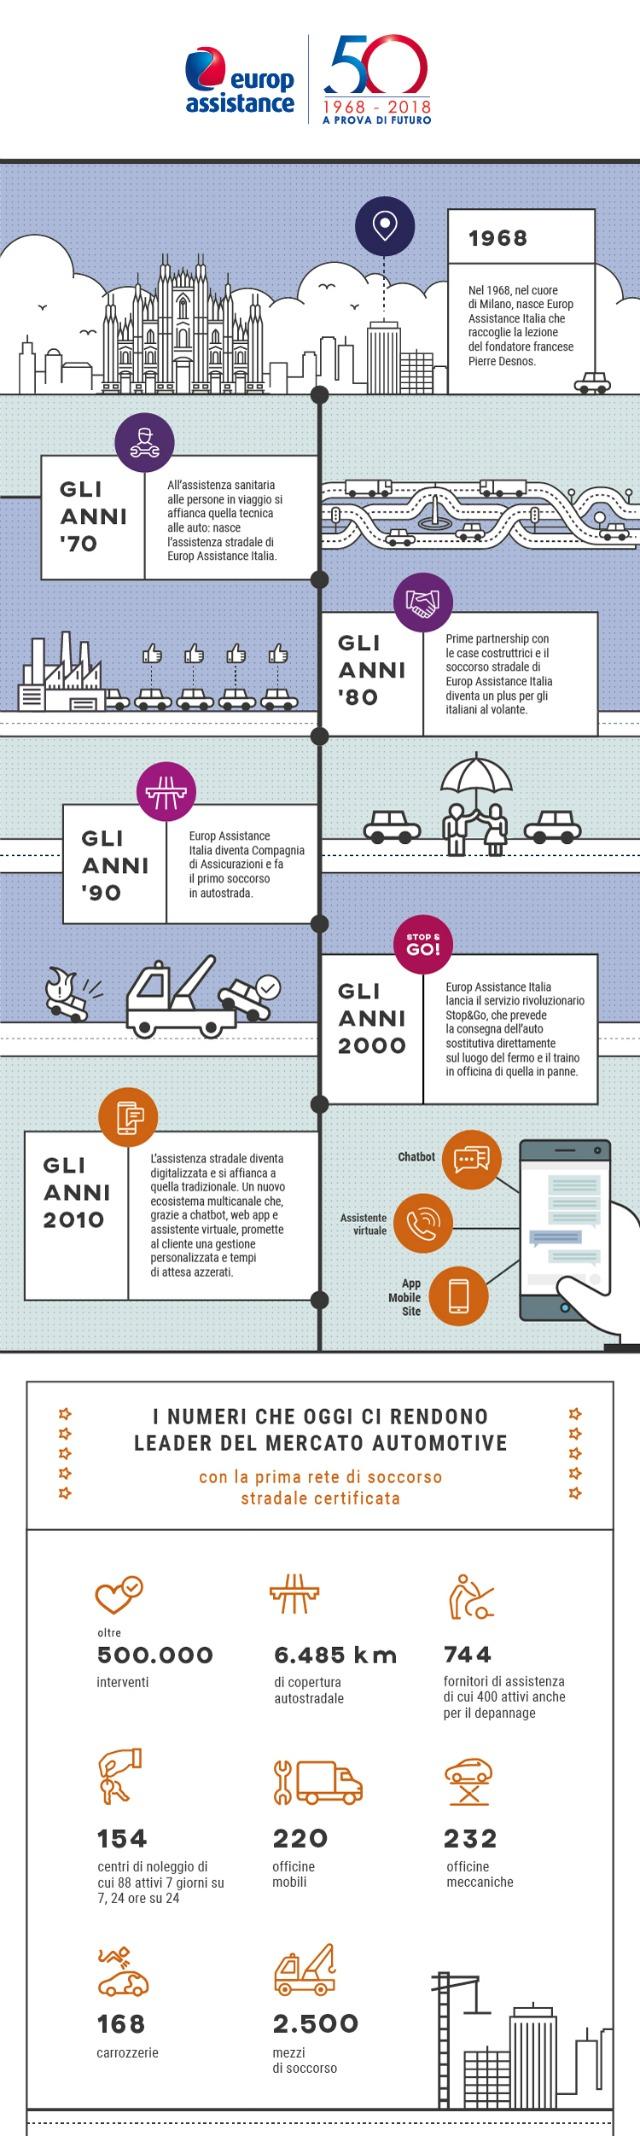 la storia di Europ Assistance Italia